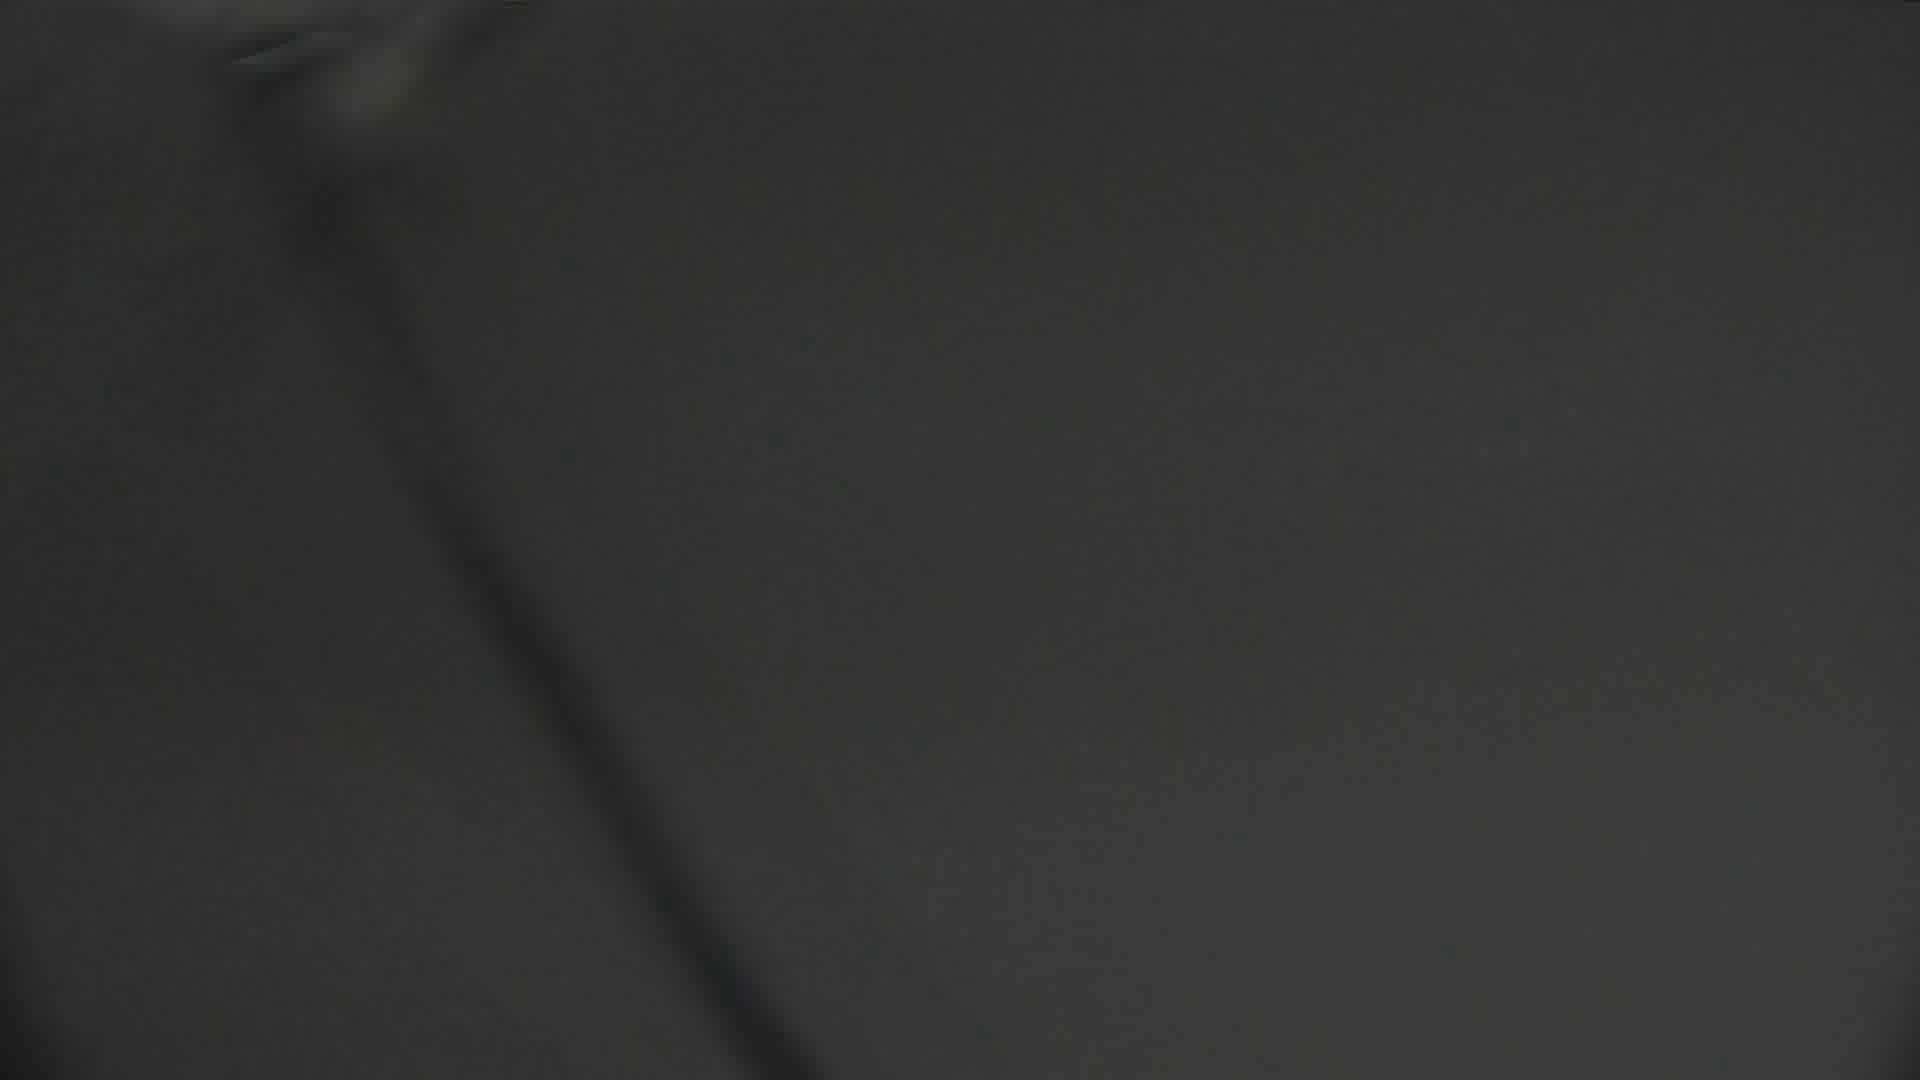 vol.27 命がけ潜伏洗面所! 小嶋陽菜似のピンクオシャレさん OL  87pic 33